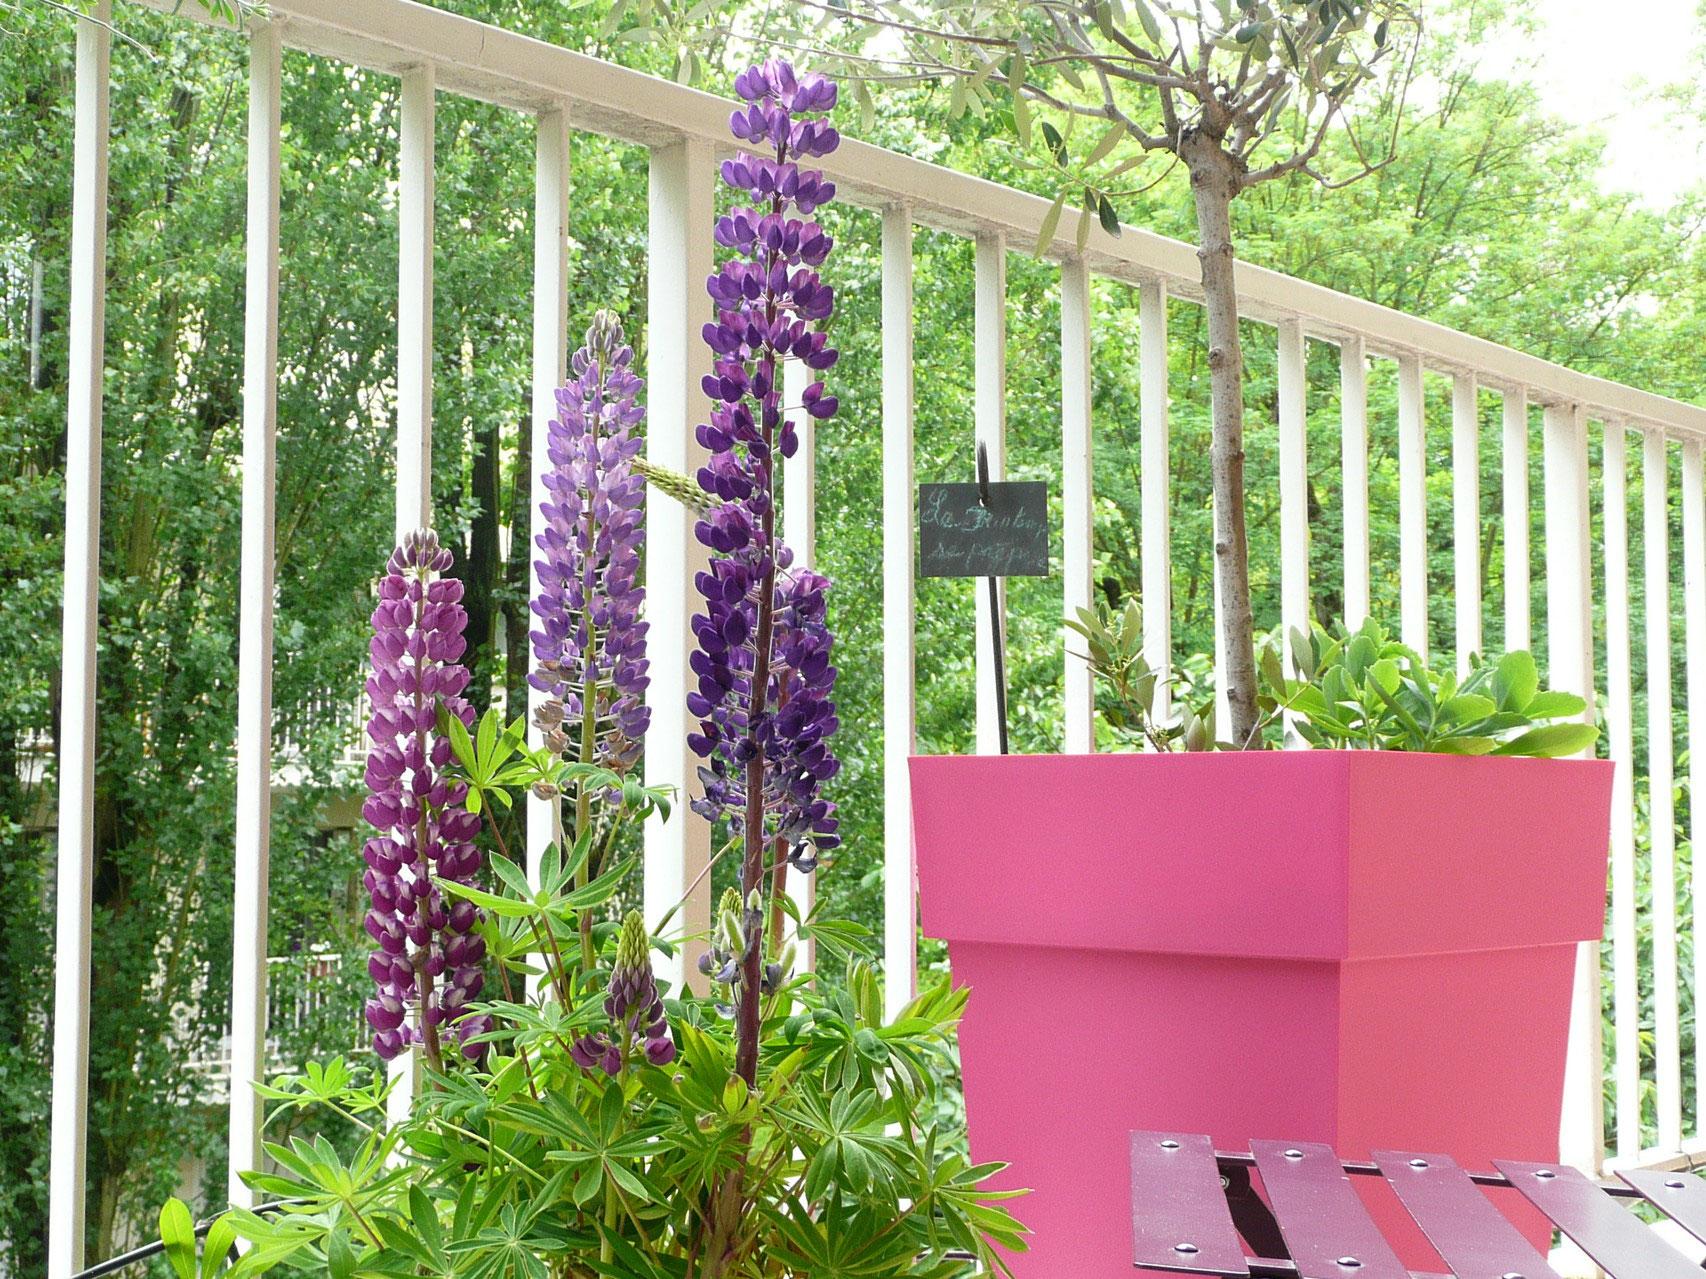 Particuliers privil ge jardin paysagistes conseil for Tarif paysagiste conseil